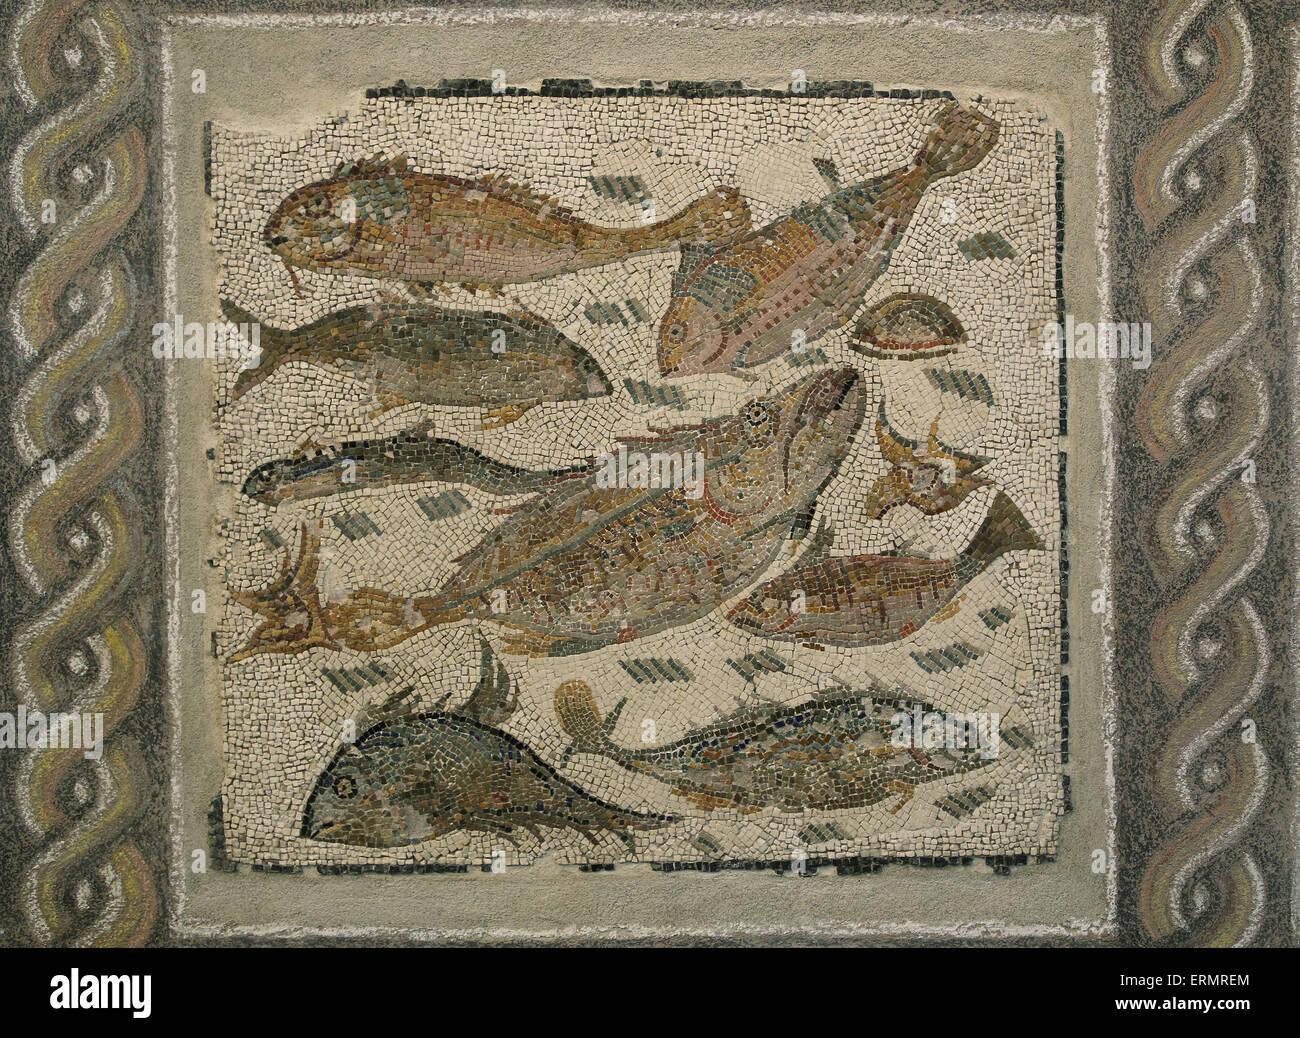 Antico pavimento in mosaico con pesci 2a 3a secolo museo for Pavimento con mosaico